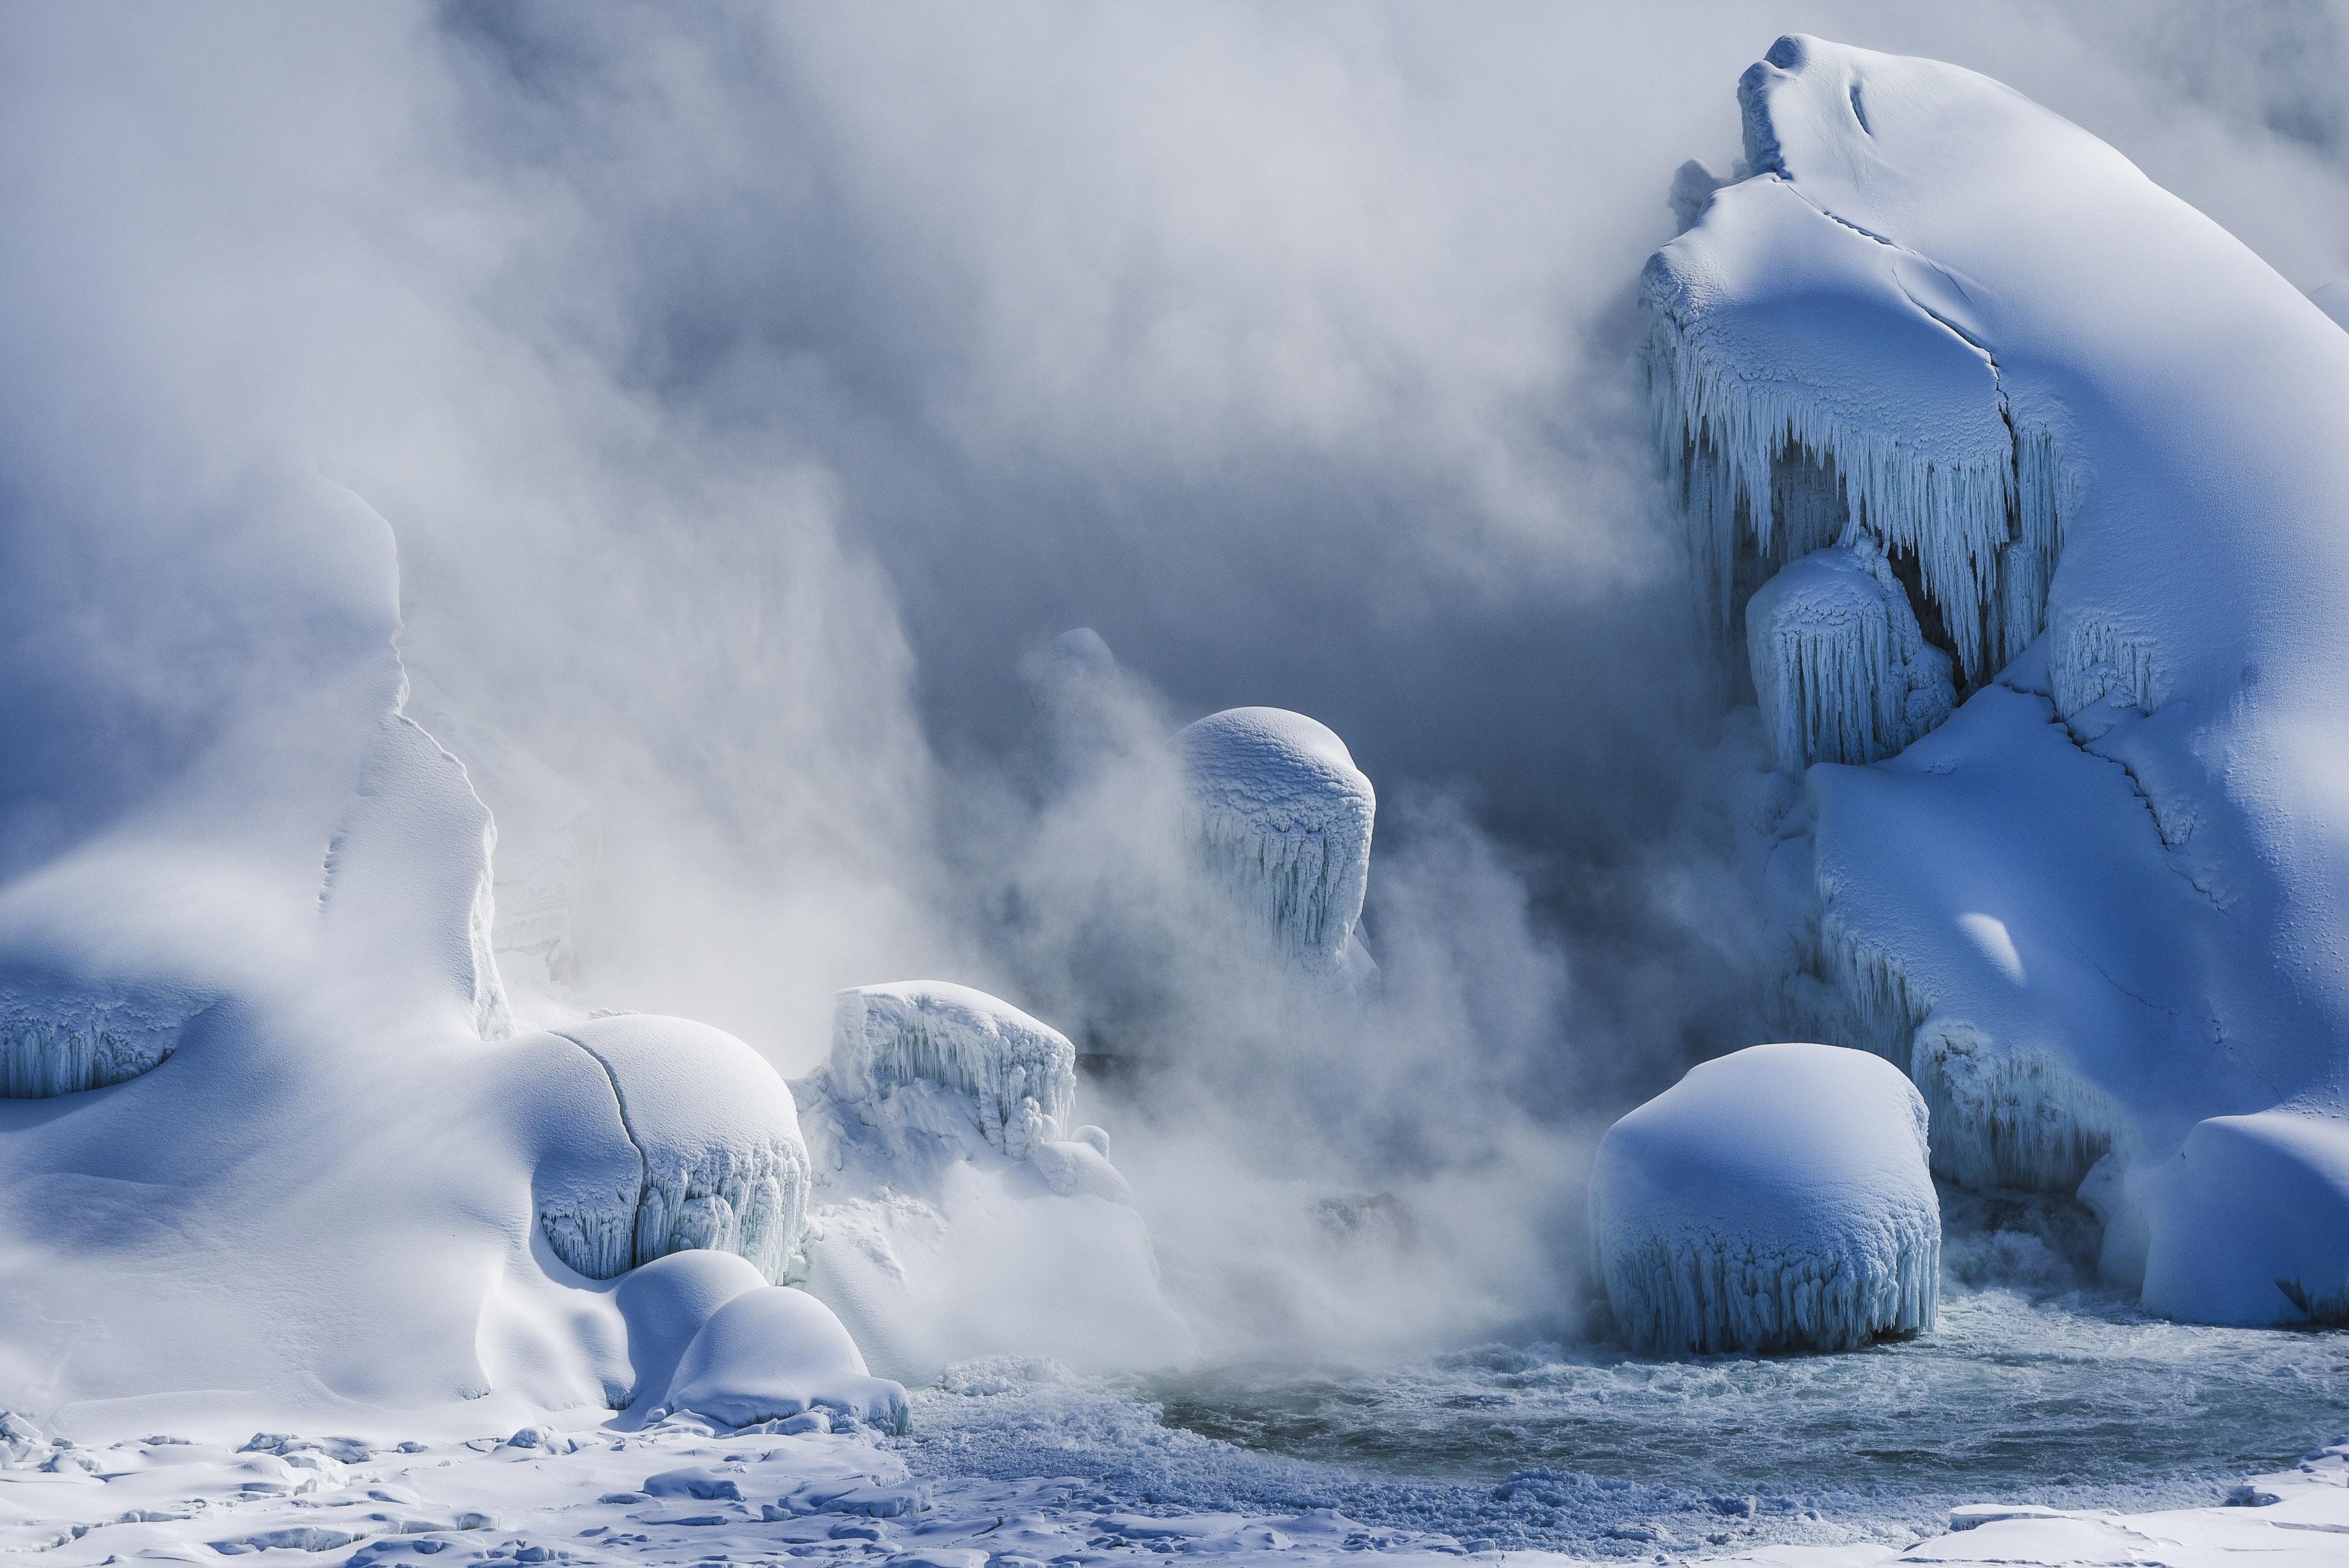 Live Niagara Falls Wallpaper Frozen Niagara Falls Niagara Falls Beautiful Frozen